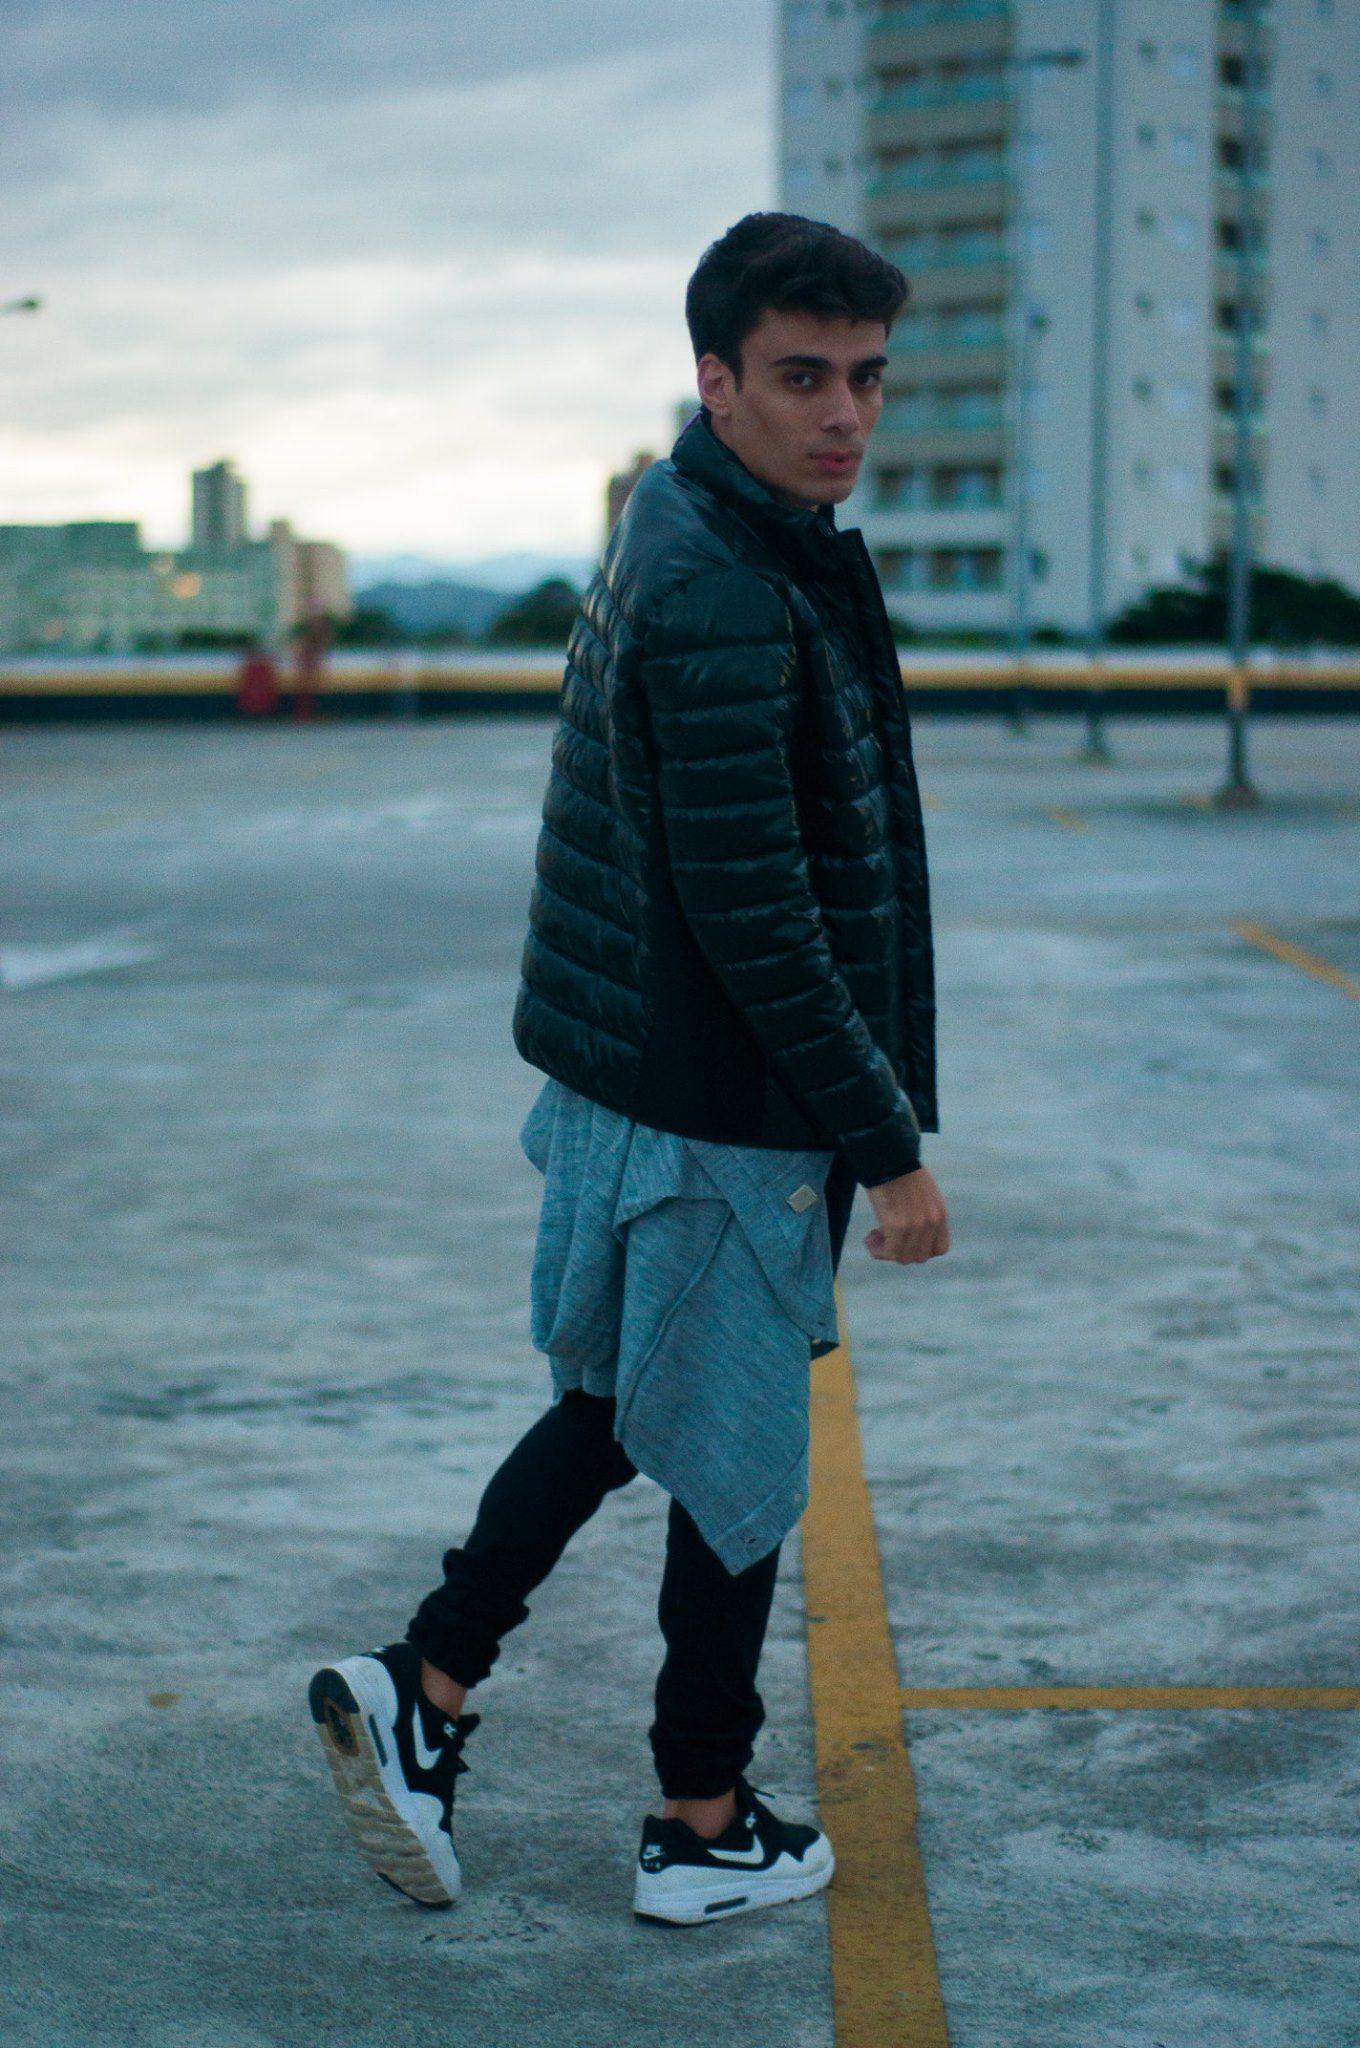 alex cursino, blogueiro de moda, fashion blogger, digital influencer, homem estiloso, dicas de moda, dicas de corte, cabelo masculino, estilo masculino, look masculino, ludmila oliveira, menswear, style,  (26)